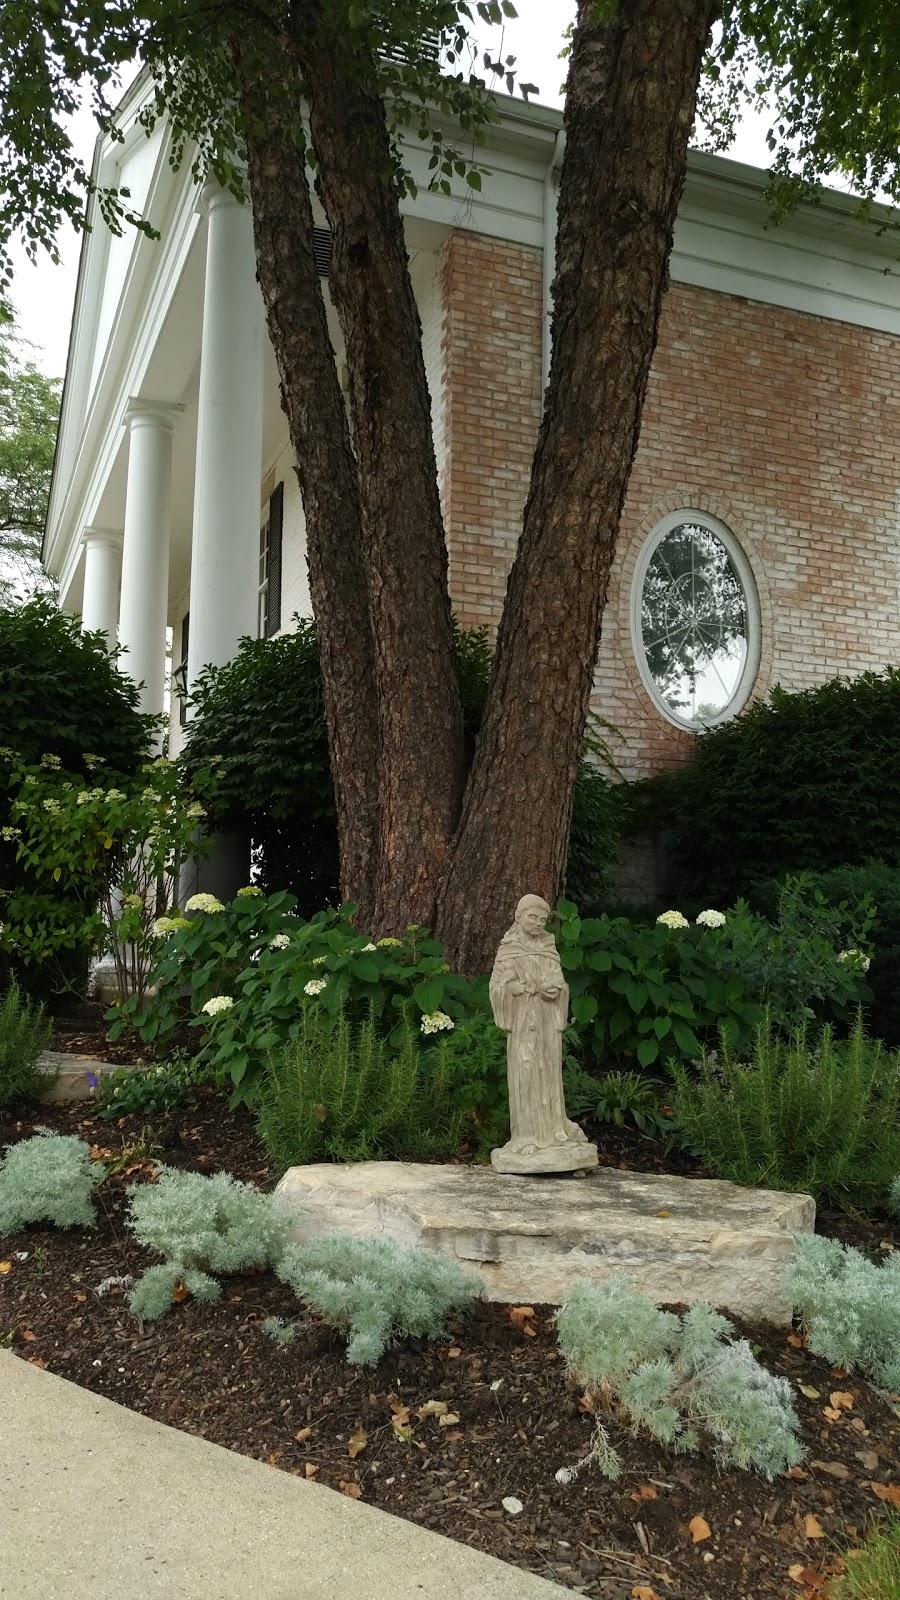 St Marks Episcopal Church - church    Photo 3 of 6   Address: 337 Ridge Rd, Barrington, IL 60010, USA   Phone: (847) 381-0596